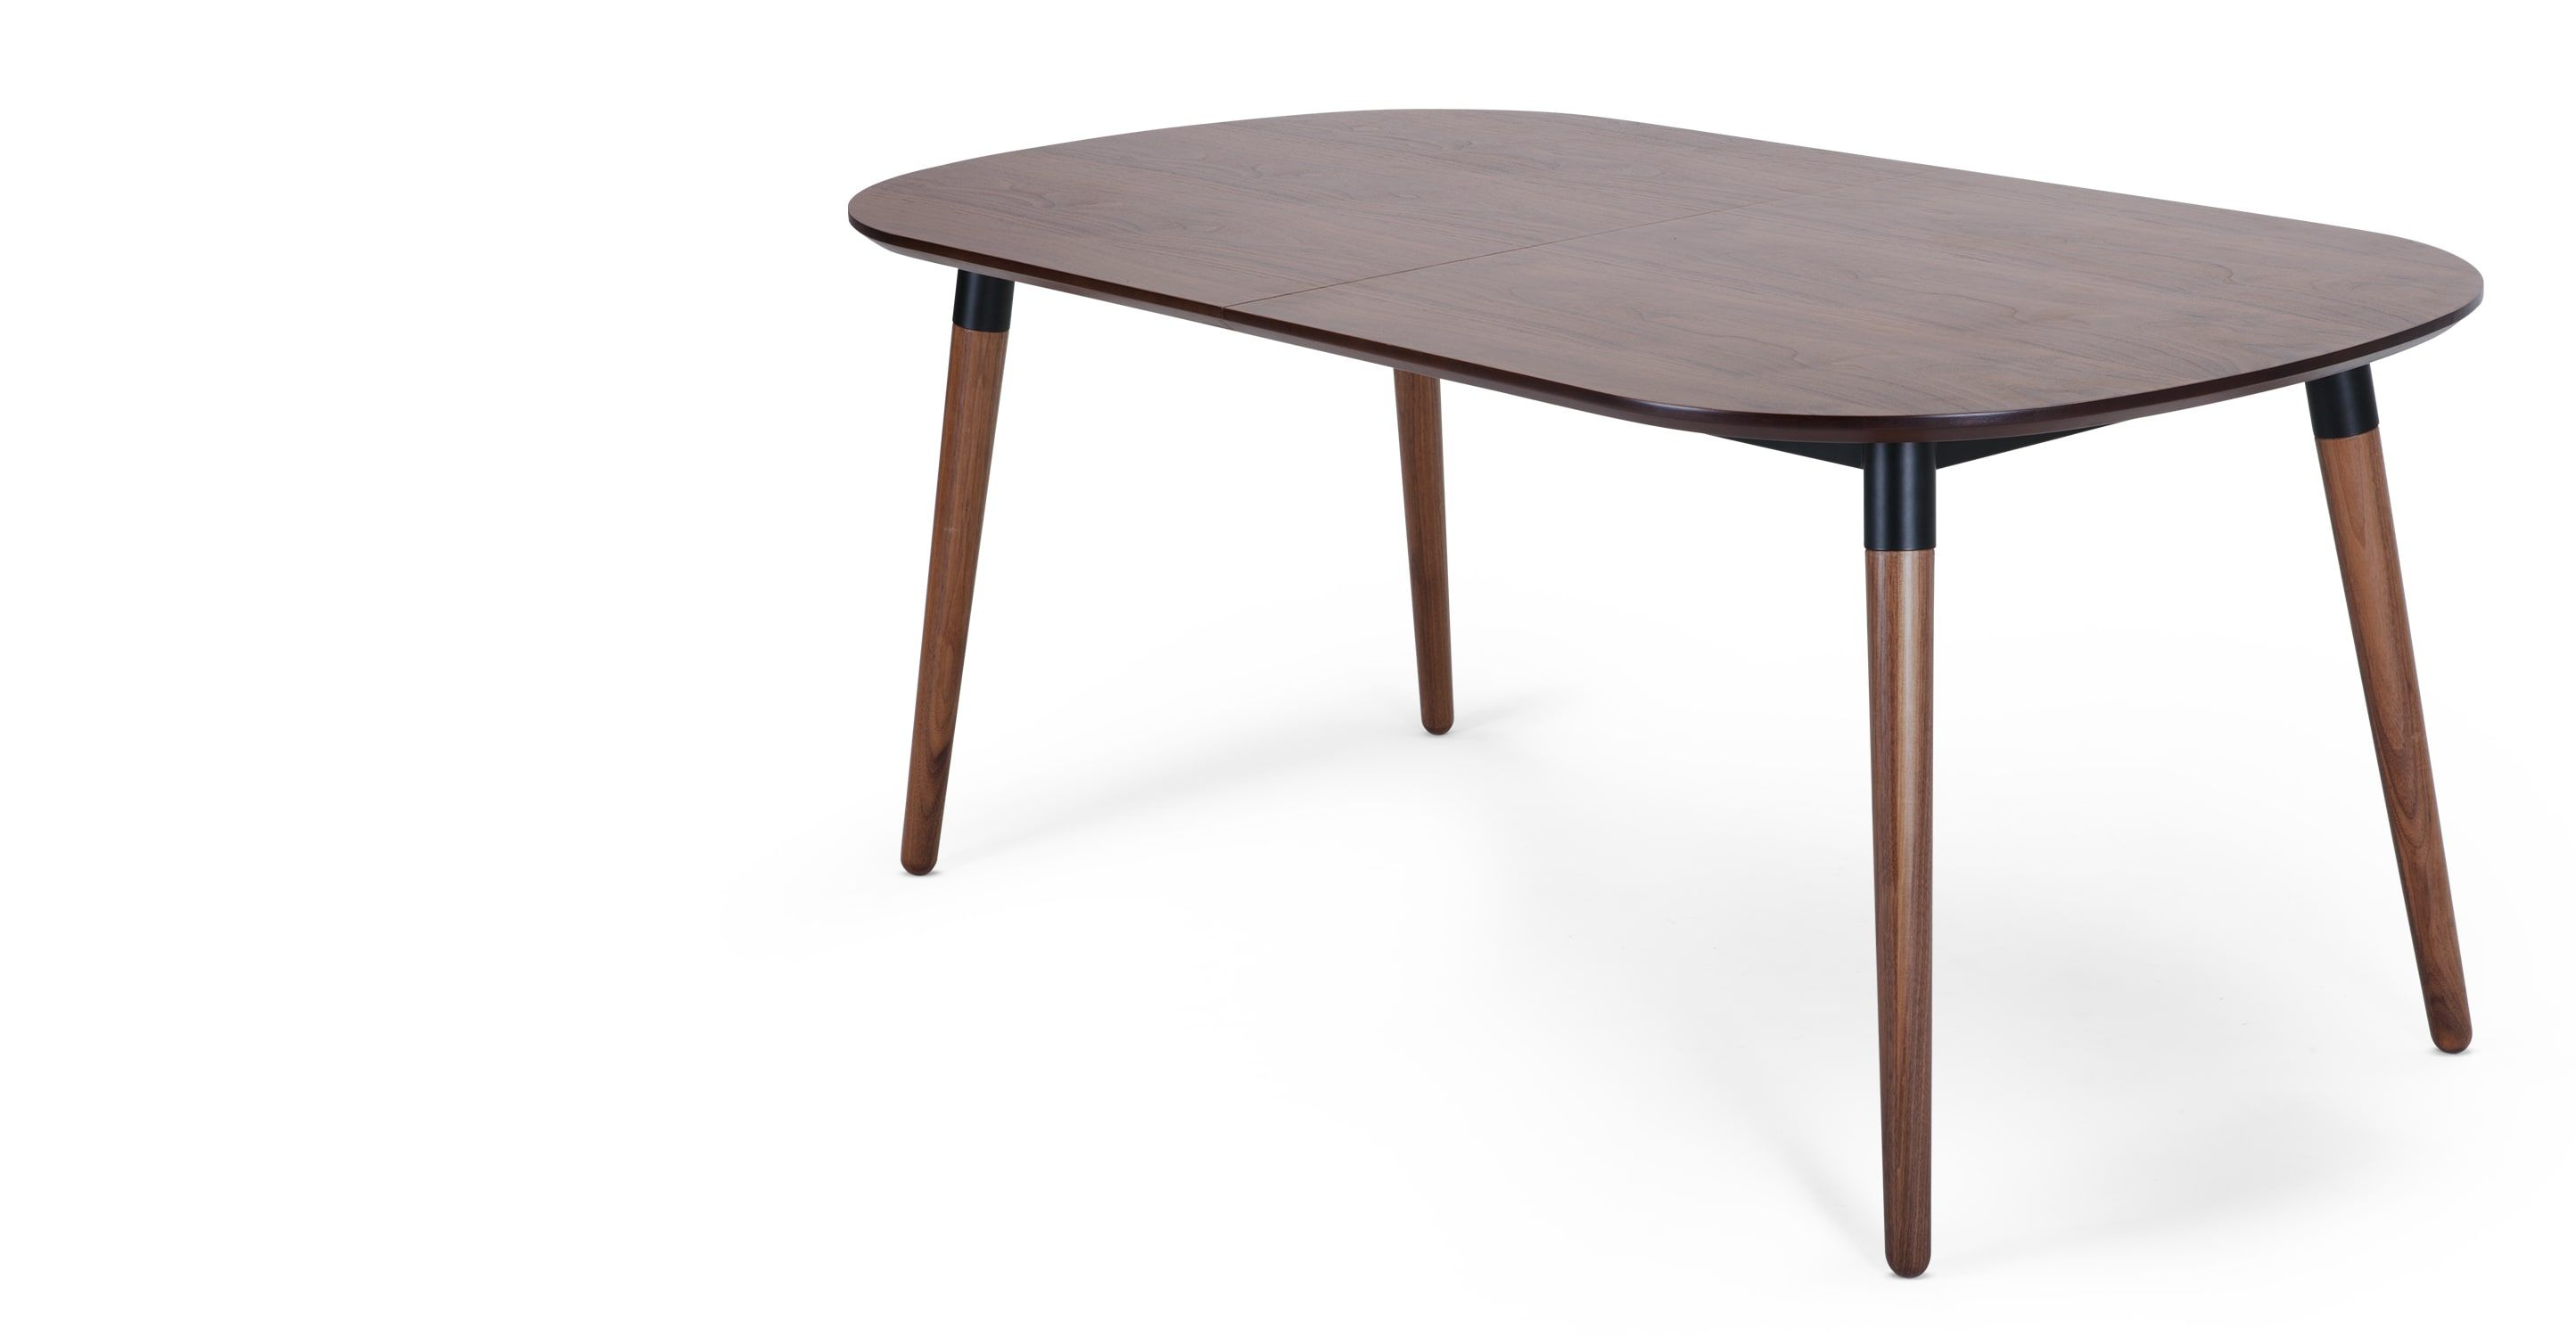 f1d7eeab31d4d838be7c7f4427cbb918 Luxe De Ikea Table Ronde Conception